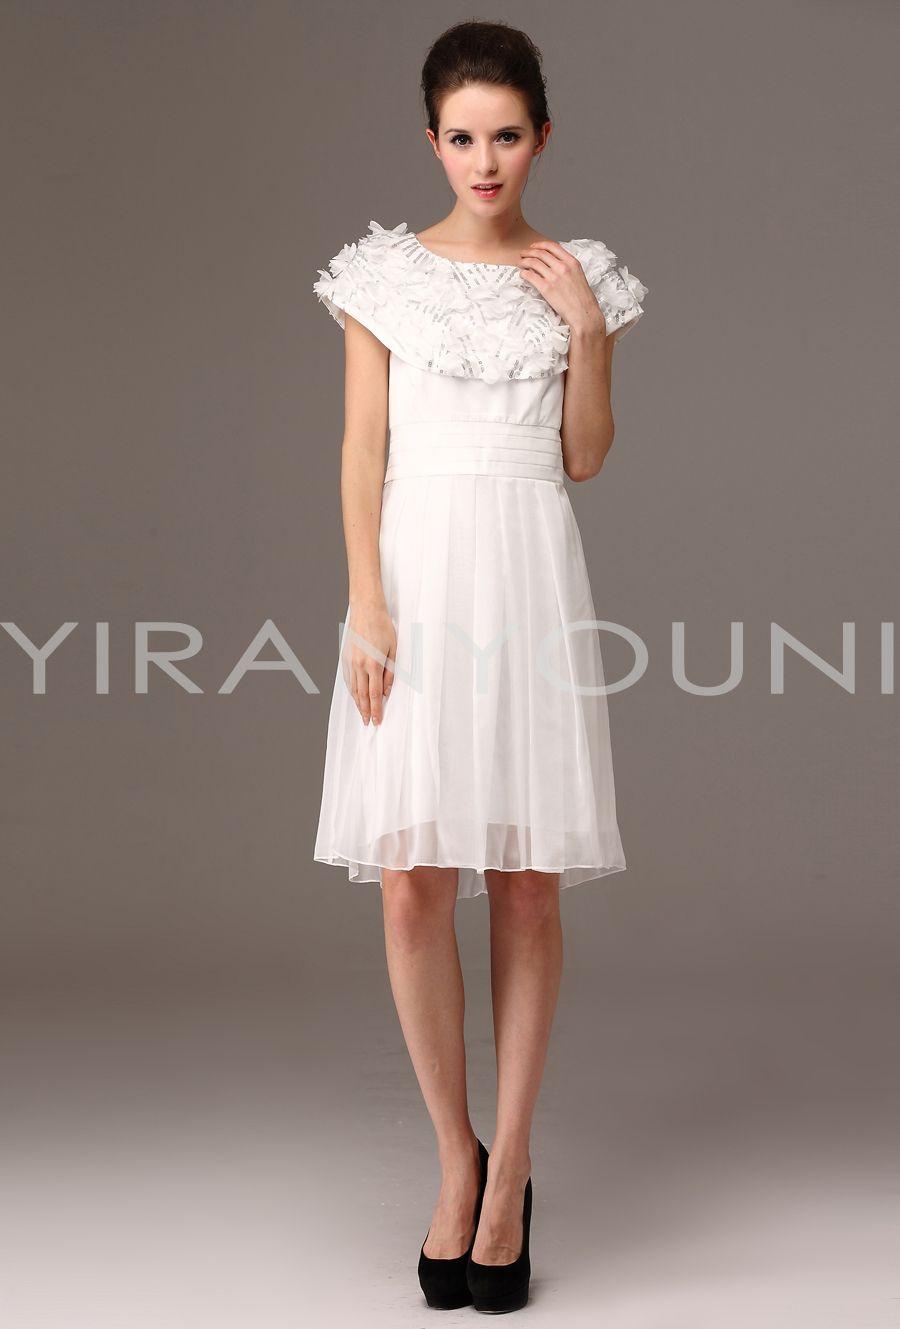 summer aesthetic three dimensional petals silk one piece dress